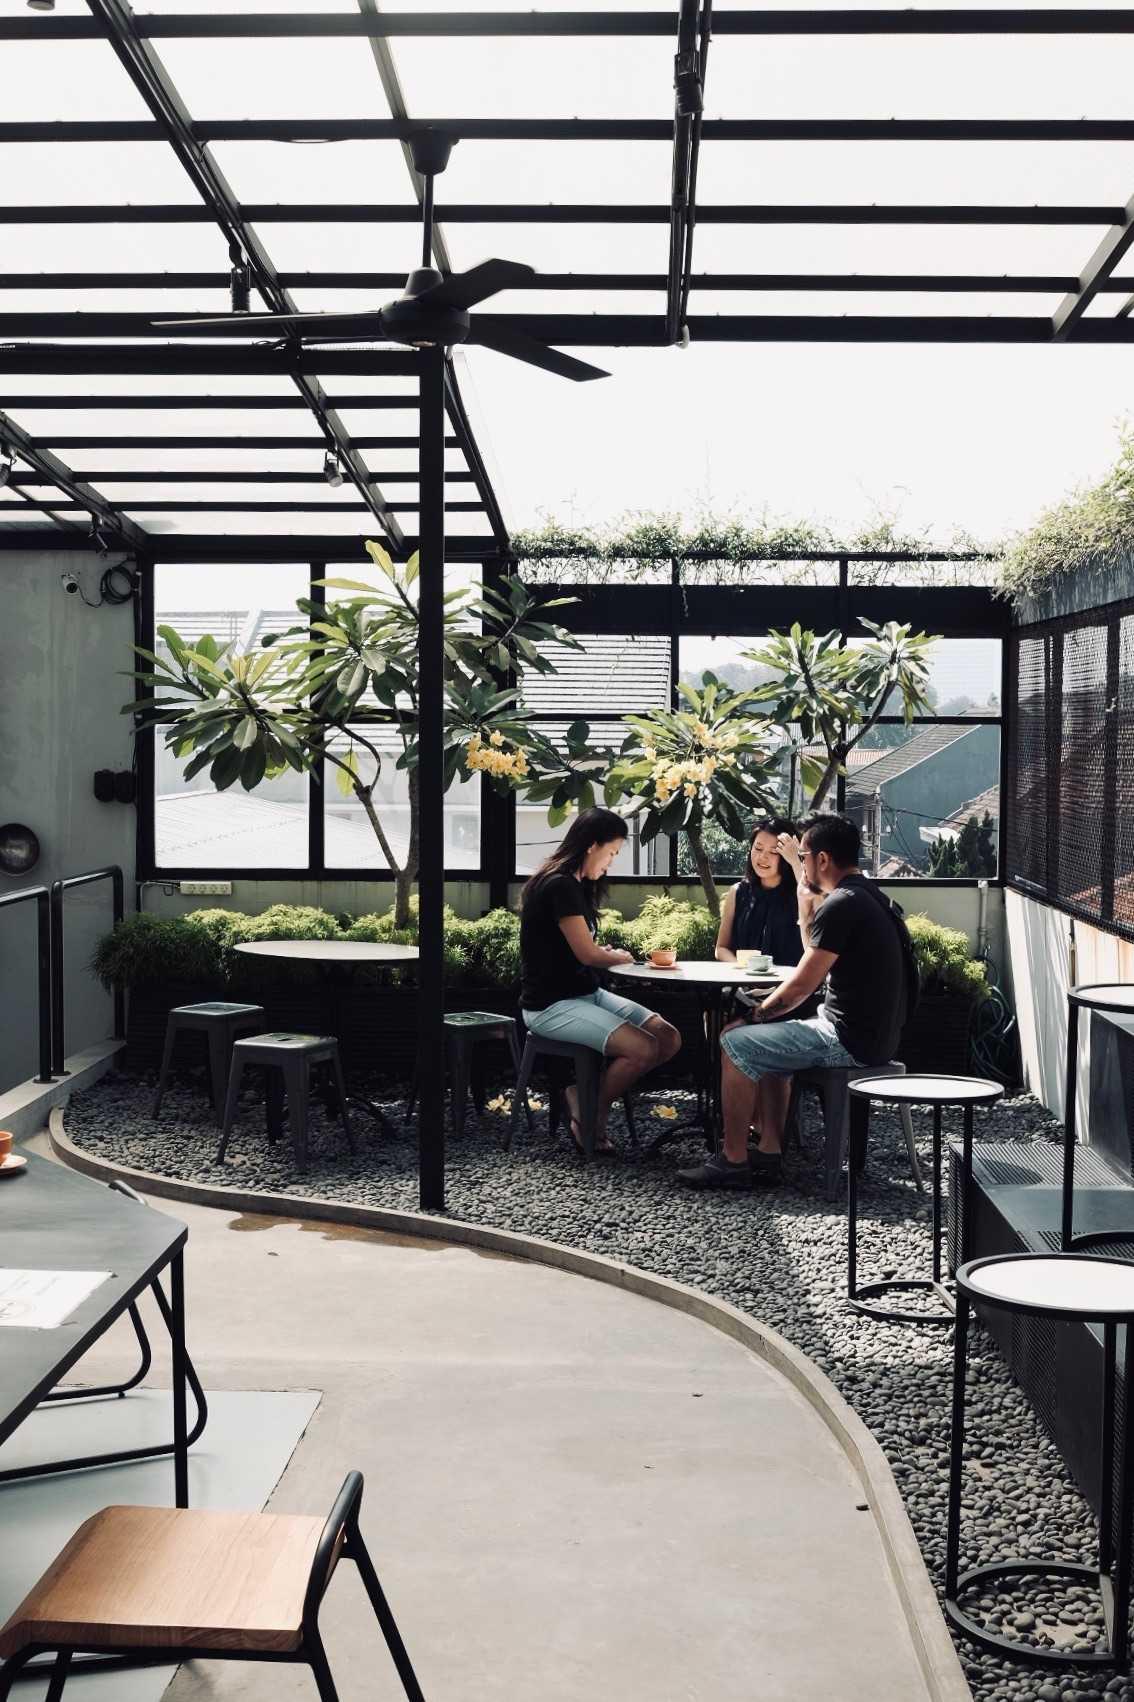 Dinardithen Studio Industrial Bakery House And Coffe At Paskal Bandung, Kota Bandung, Jawa Barat, Indonesia Bandung, Kota Bandung, Jawa Barat, Indonesia Dinardithen-Studio-Industrial-Bakery-House-And-Coffe-At-Paskal  127172